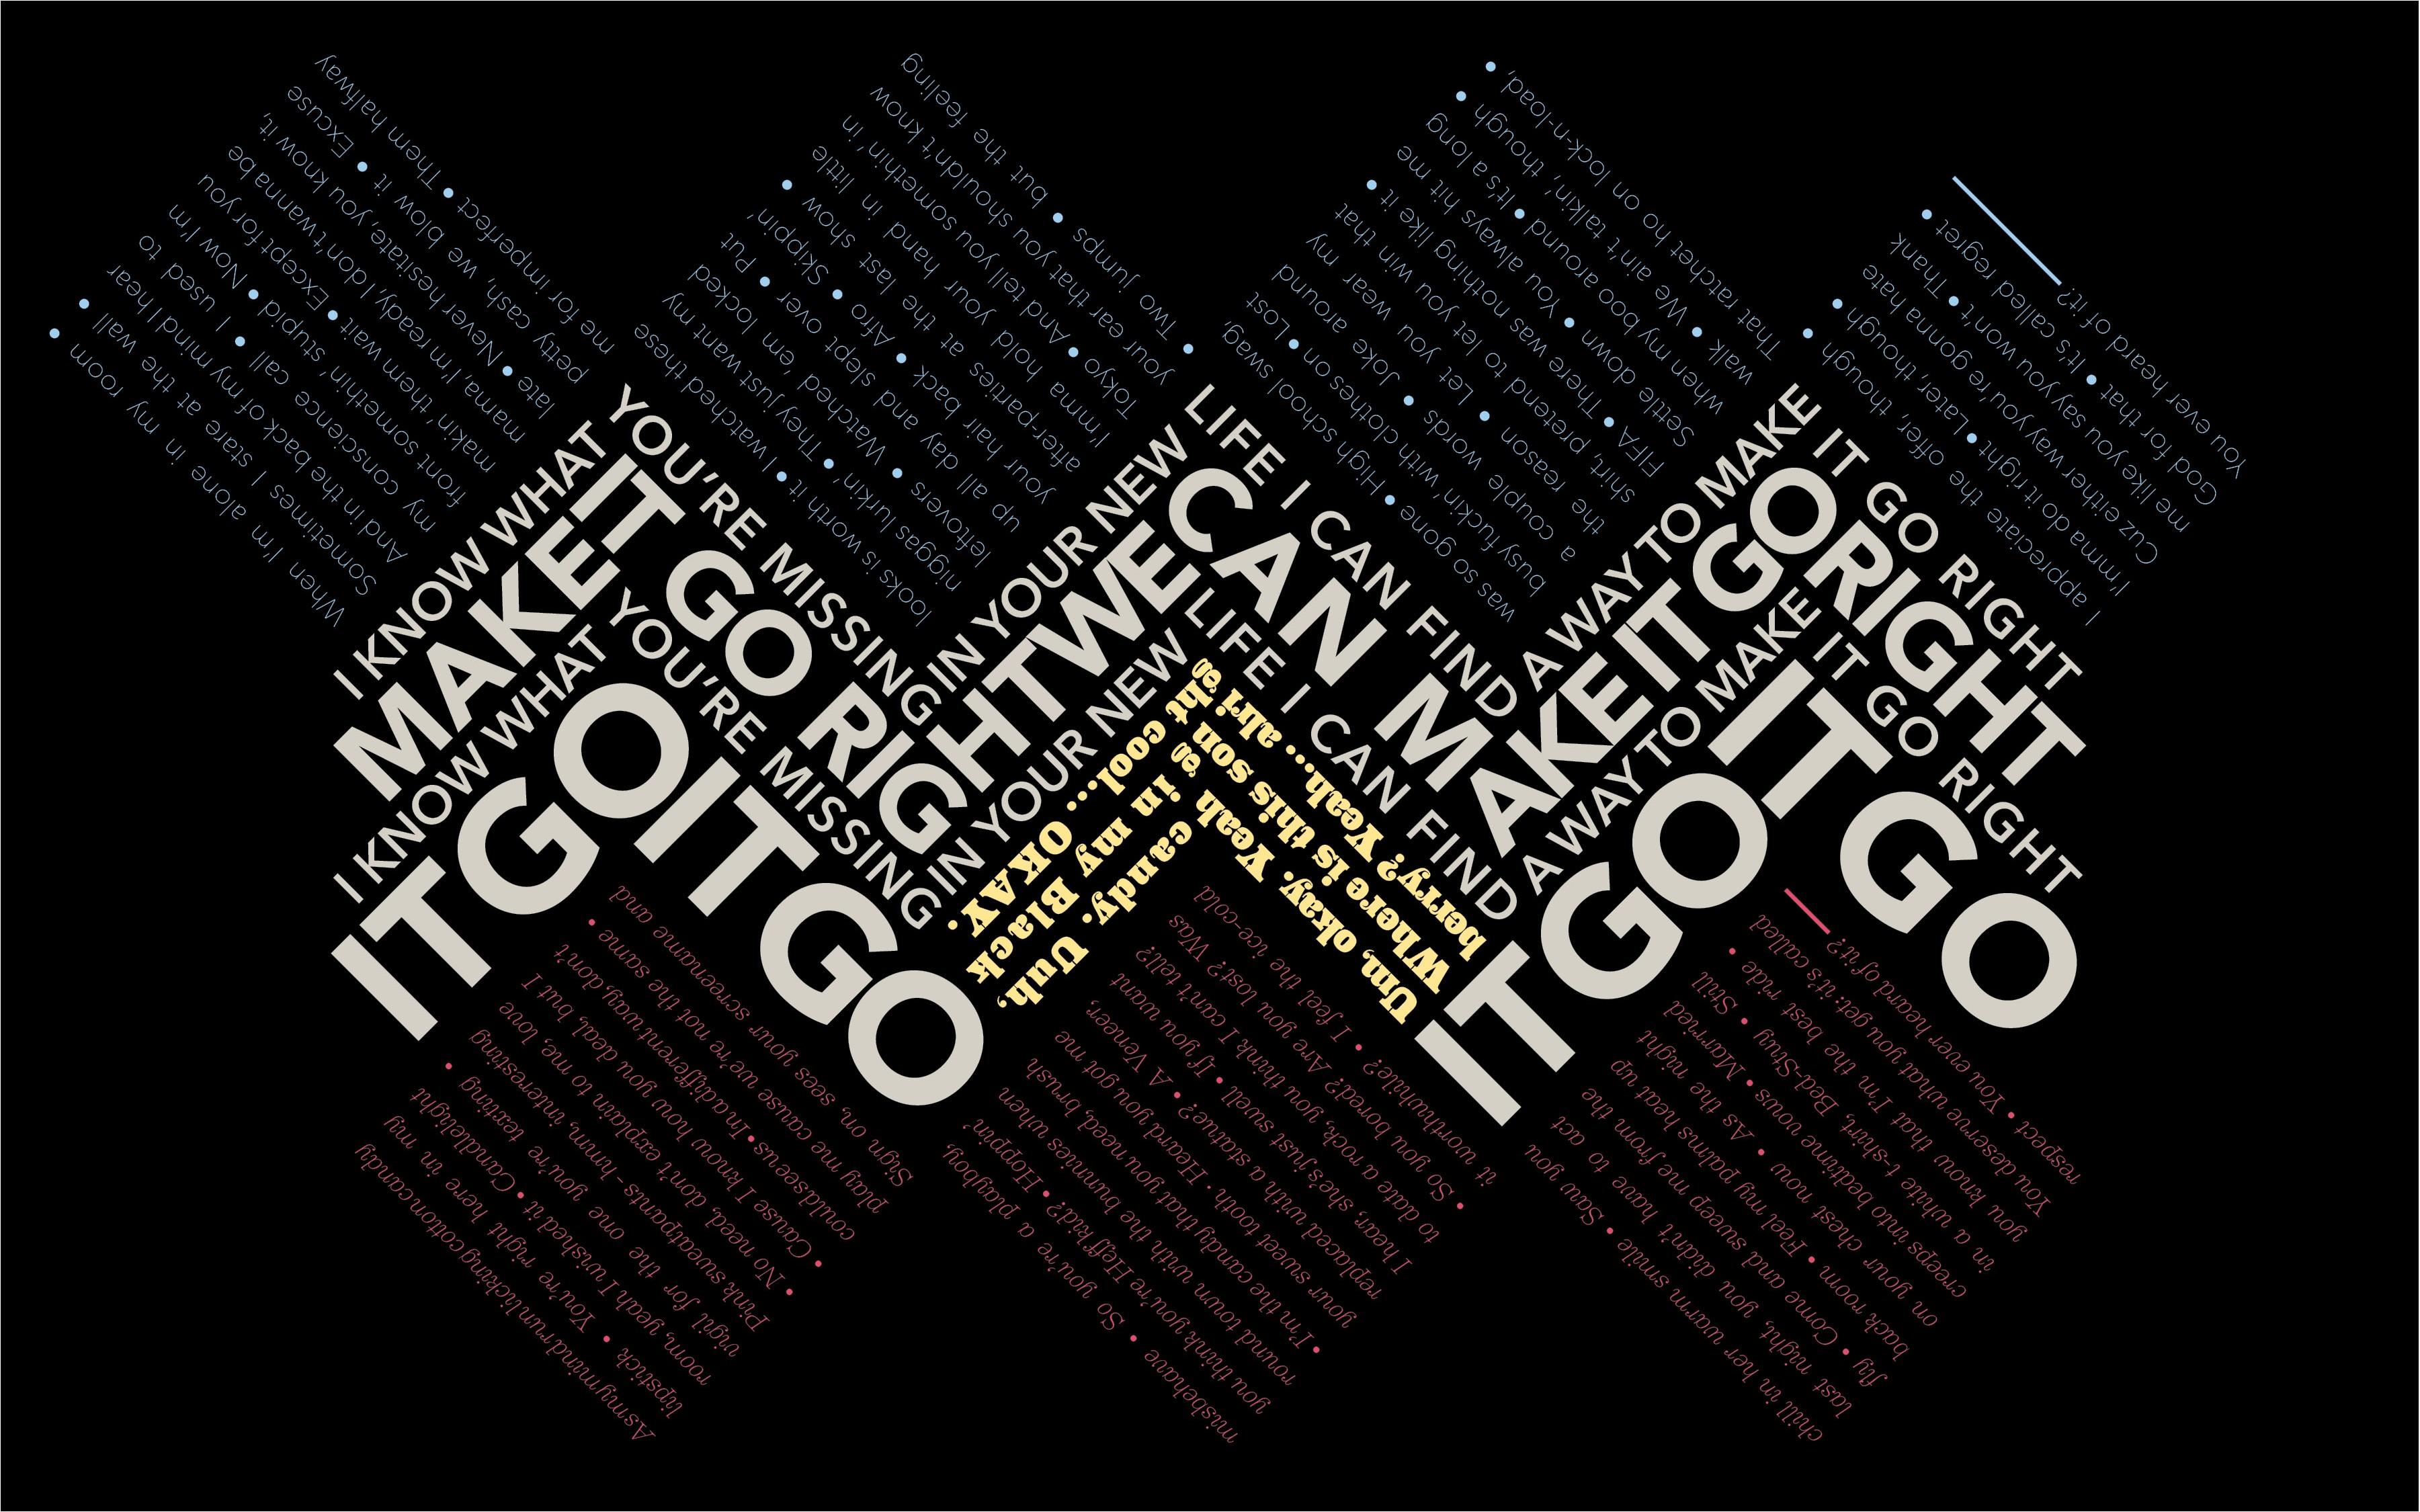 Typography Poster Emily Carr University